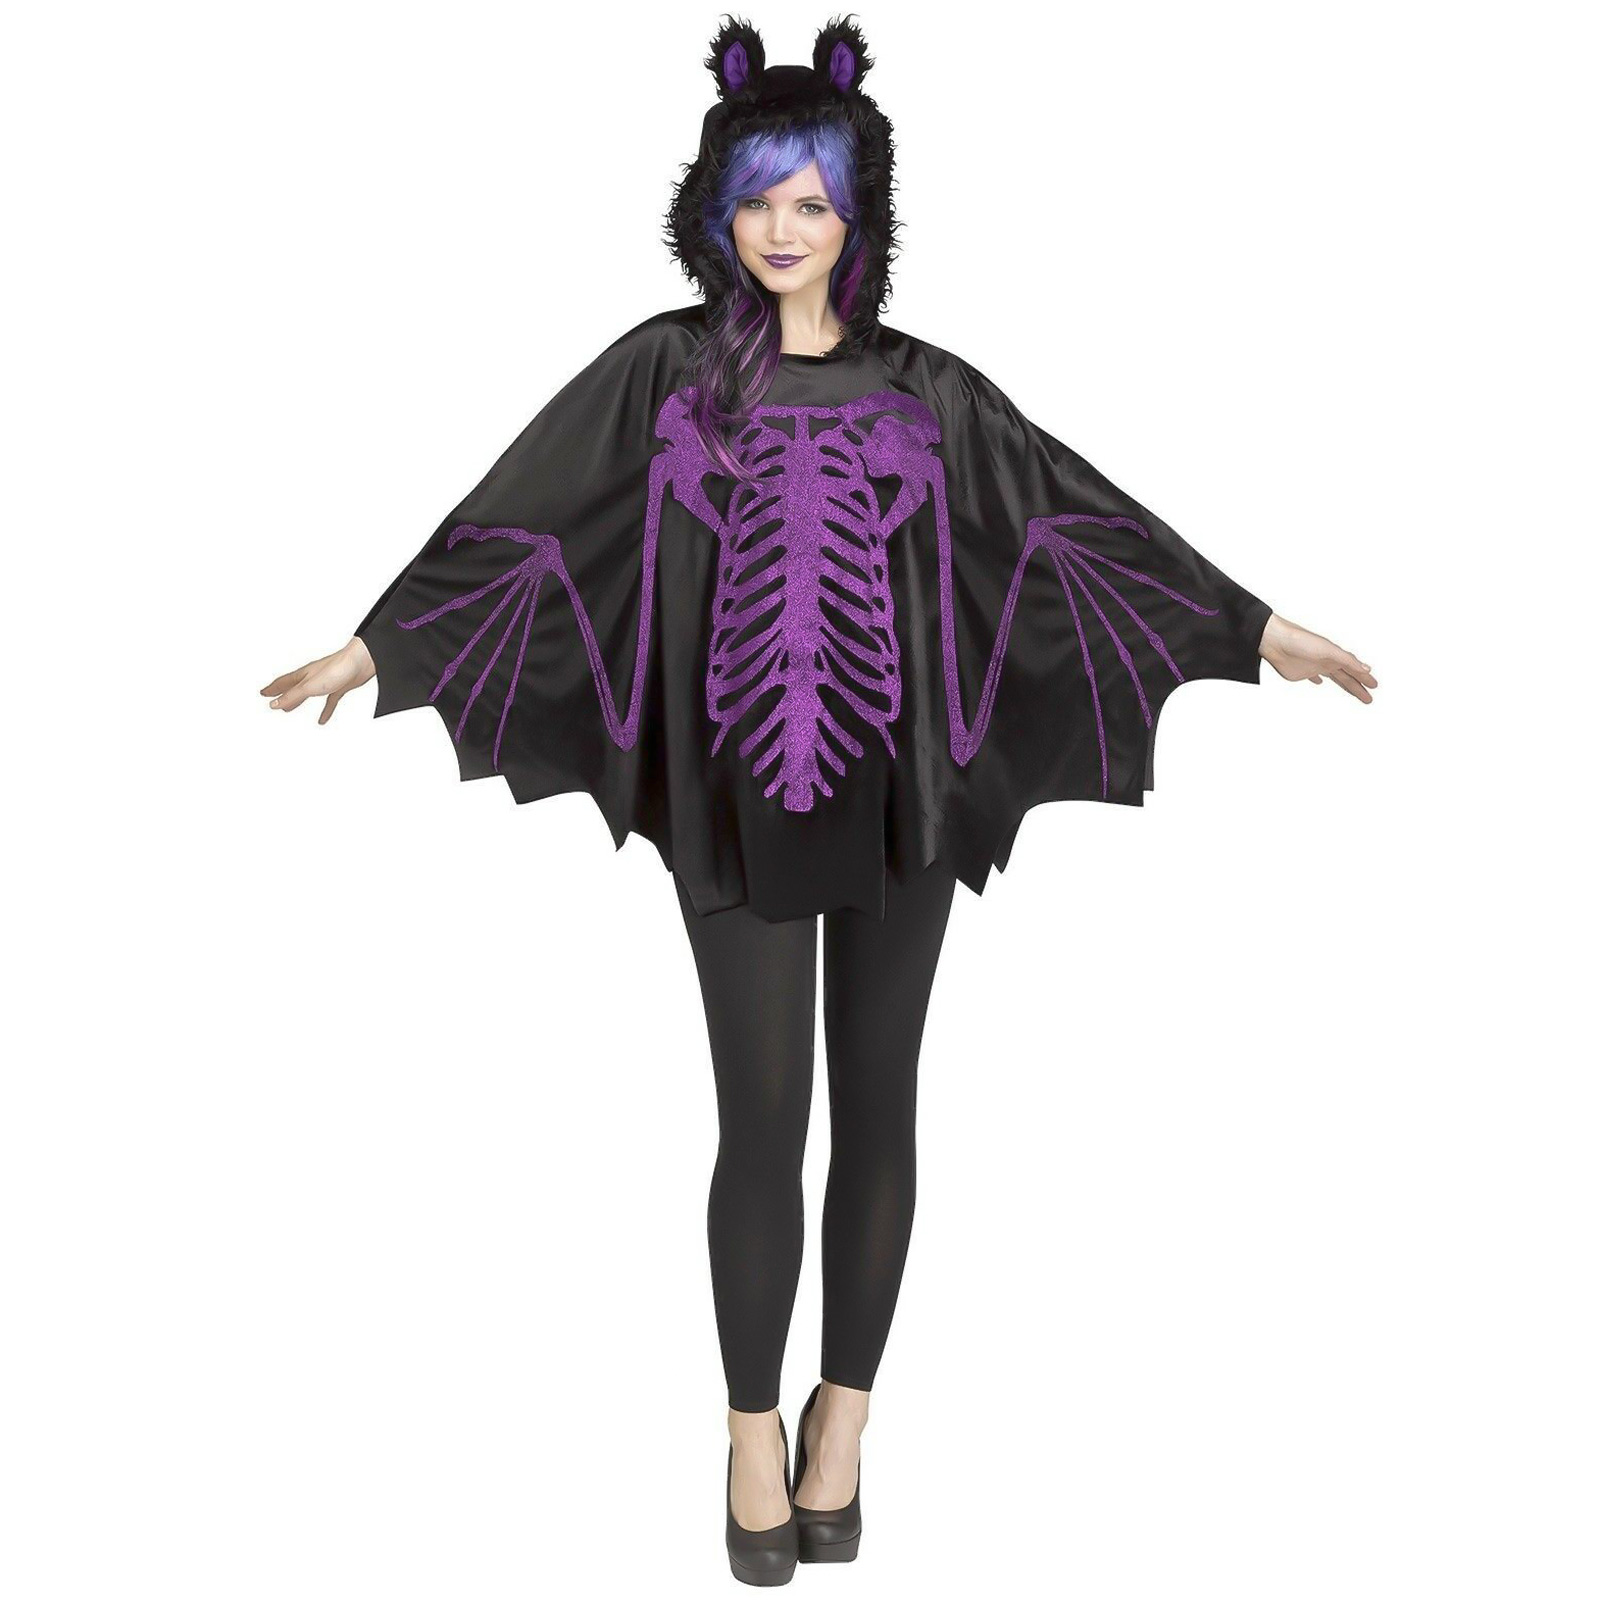 Mavis Halloween Costume Toddler.Details About Adult Women S Vampire Bat Skeleton Hooded Cape Halloween Costume Poncho Mavis